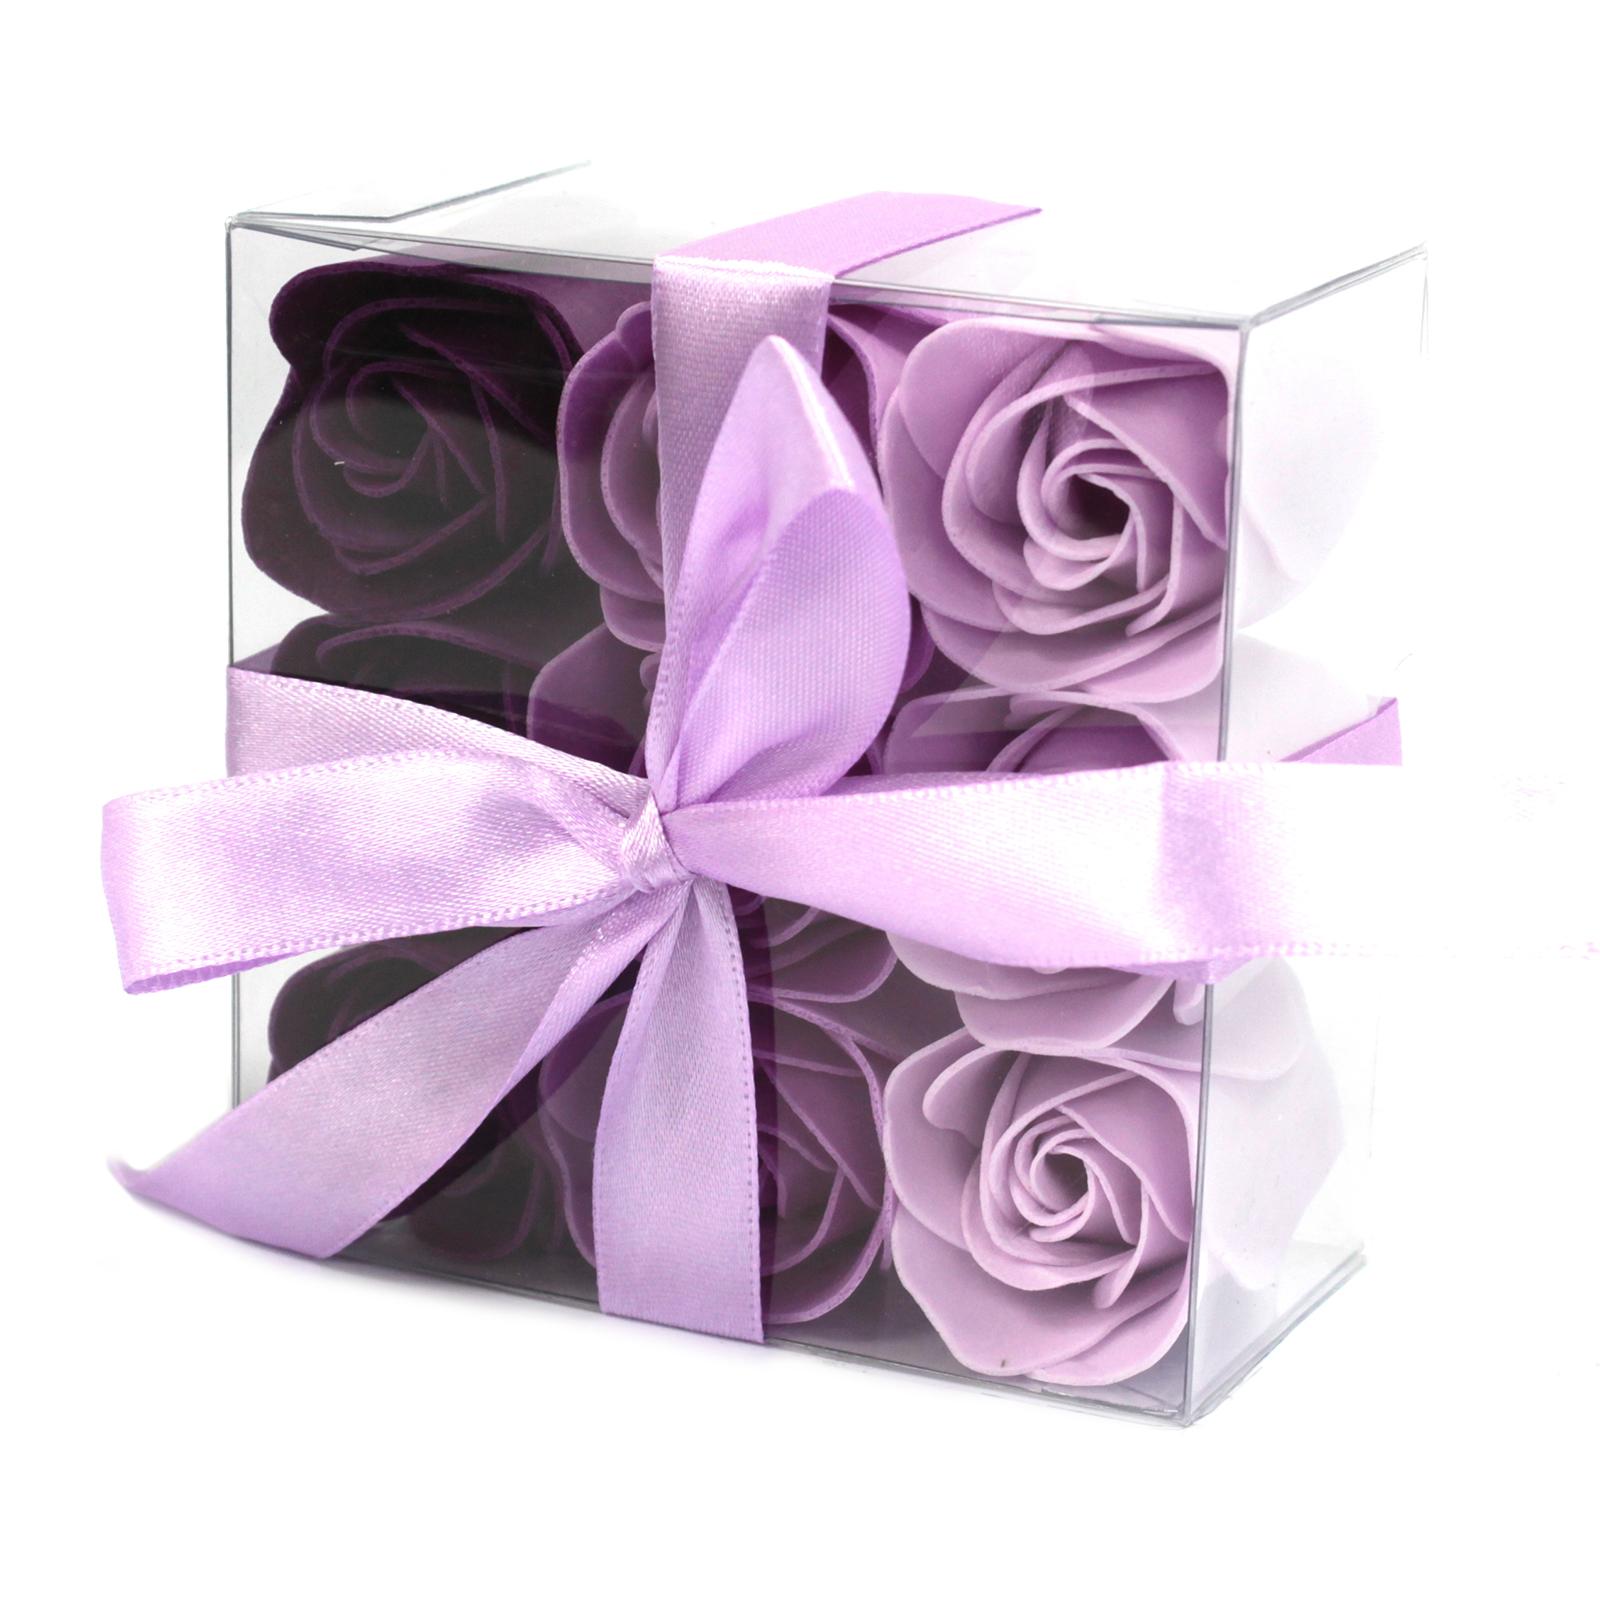 1x Set of 9 Soap Flower - Lavender Roses